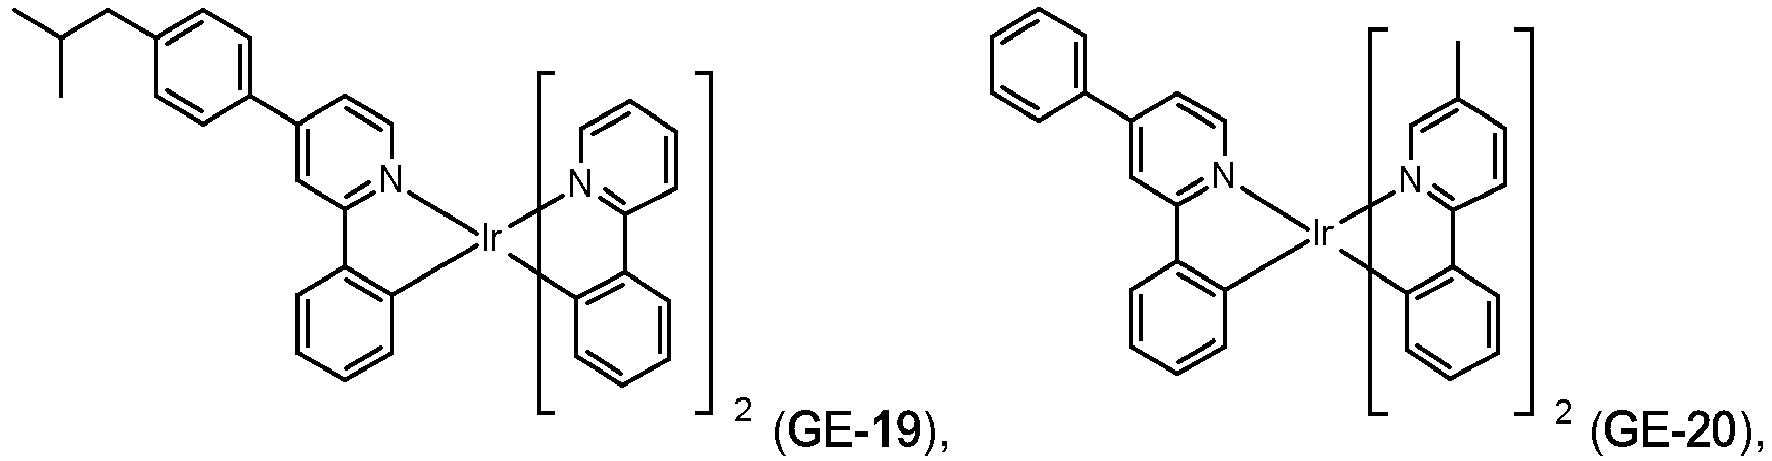 Figure imgb0817